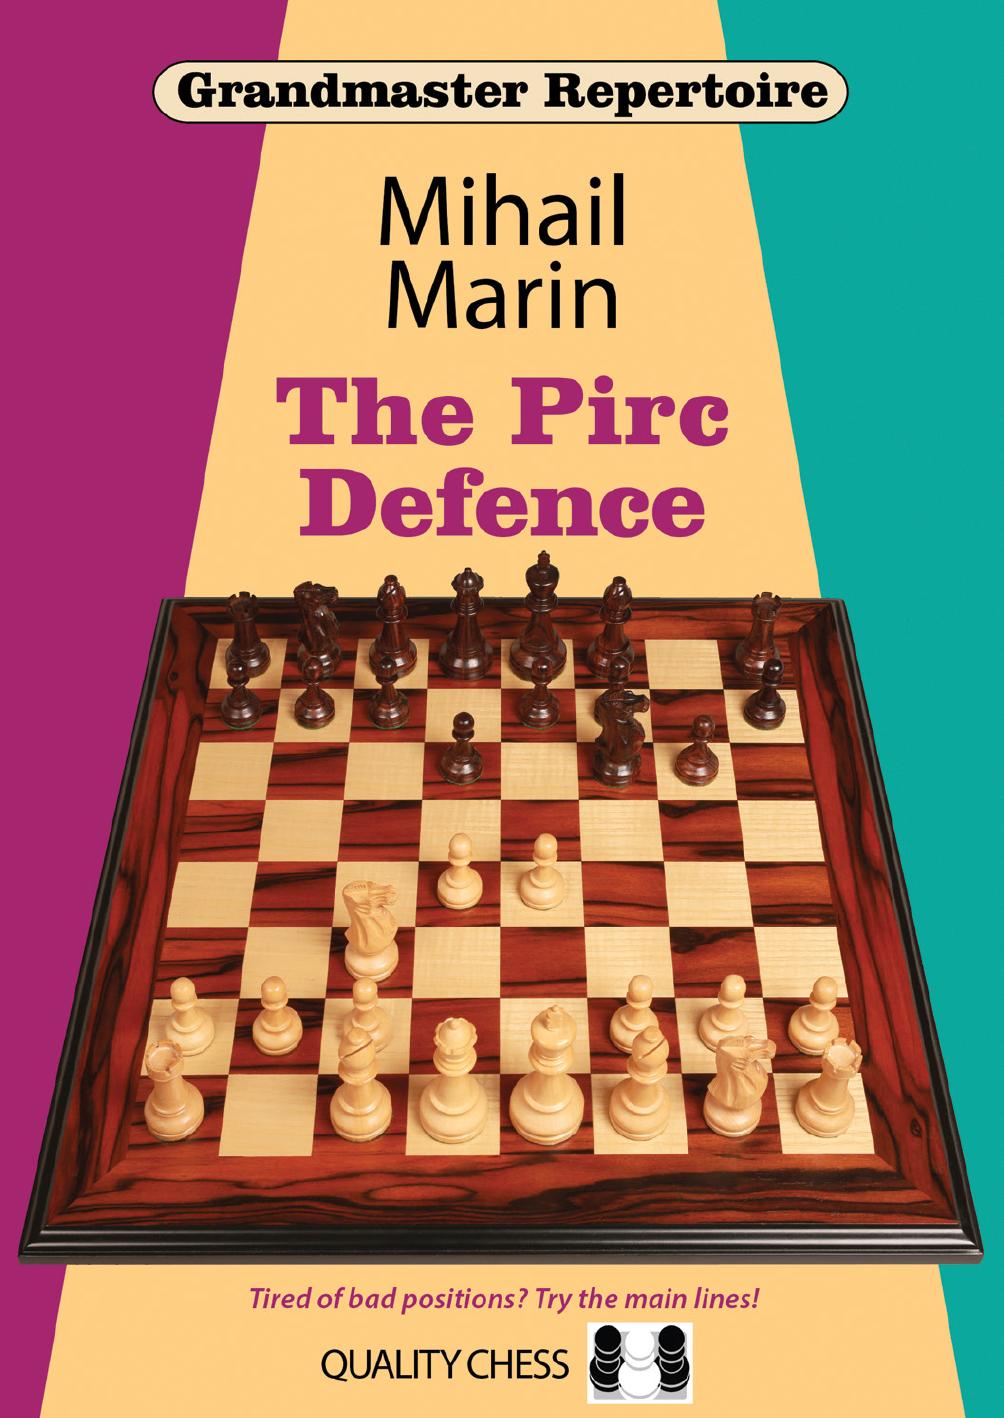 Grandmaster Repertoire The Pirc Defence